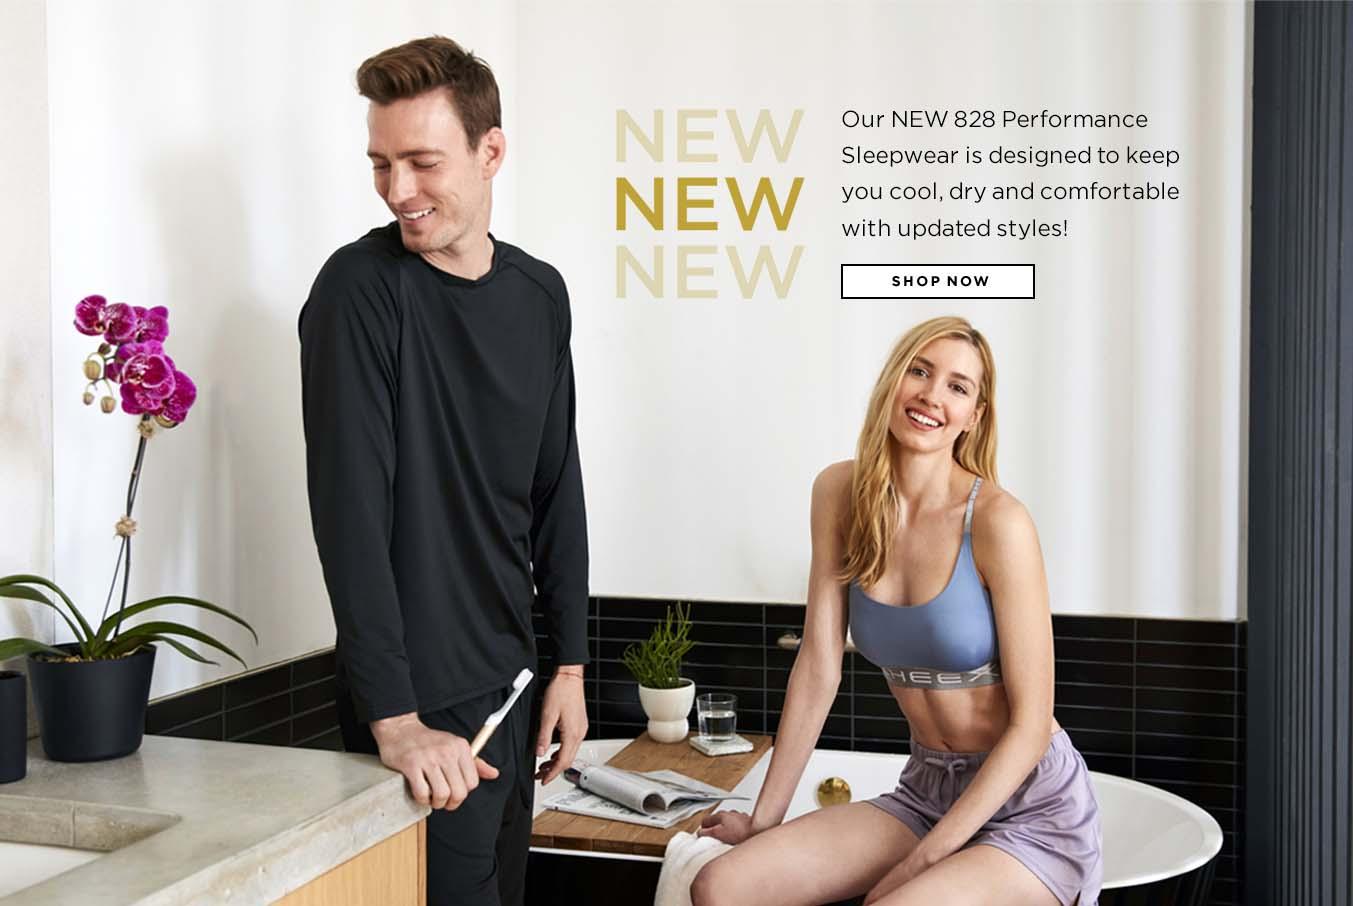 New! Performance Sleepwear